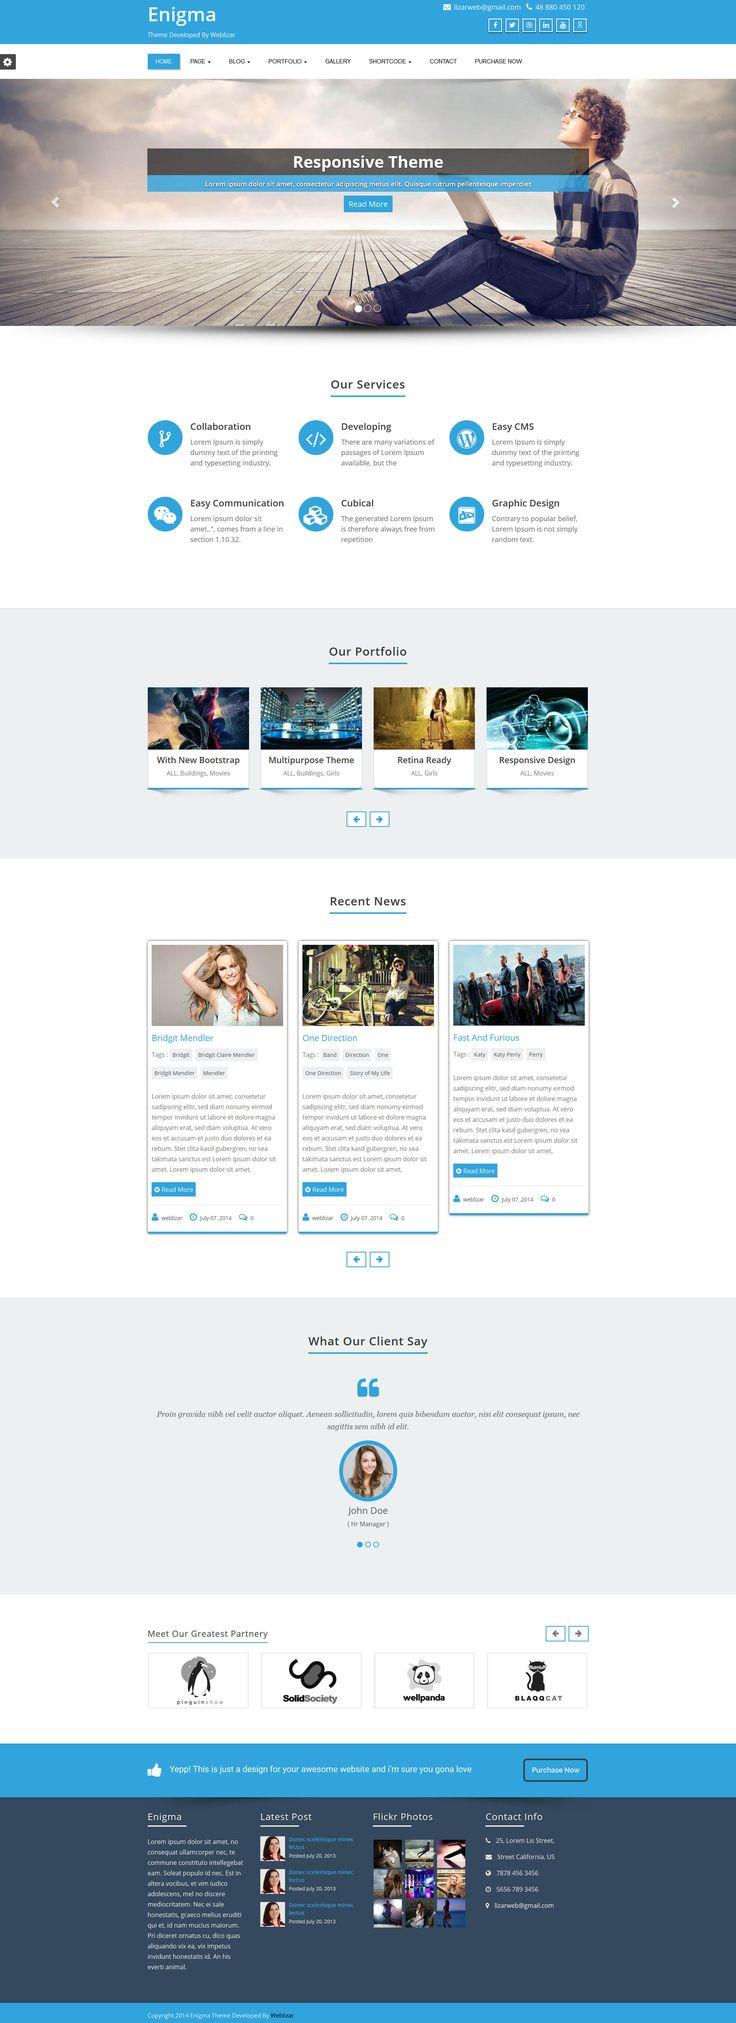 Enigma Premium WordPress Theme